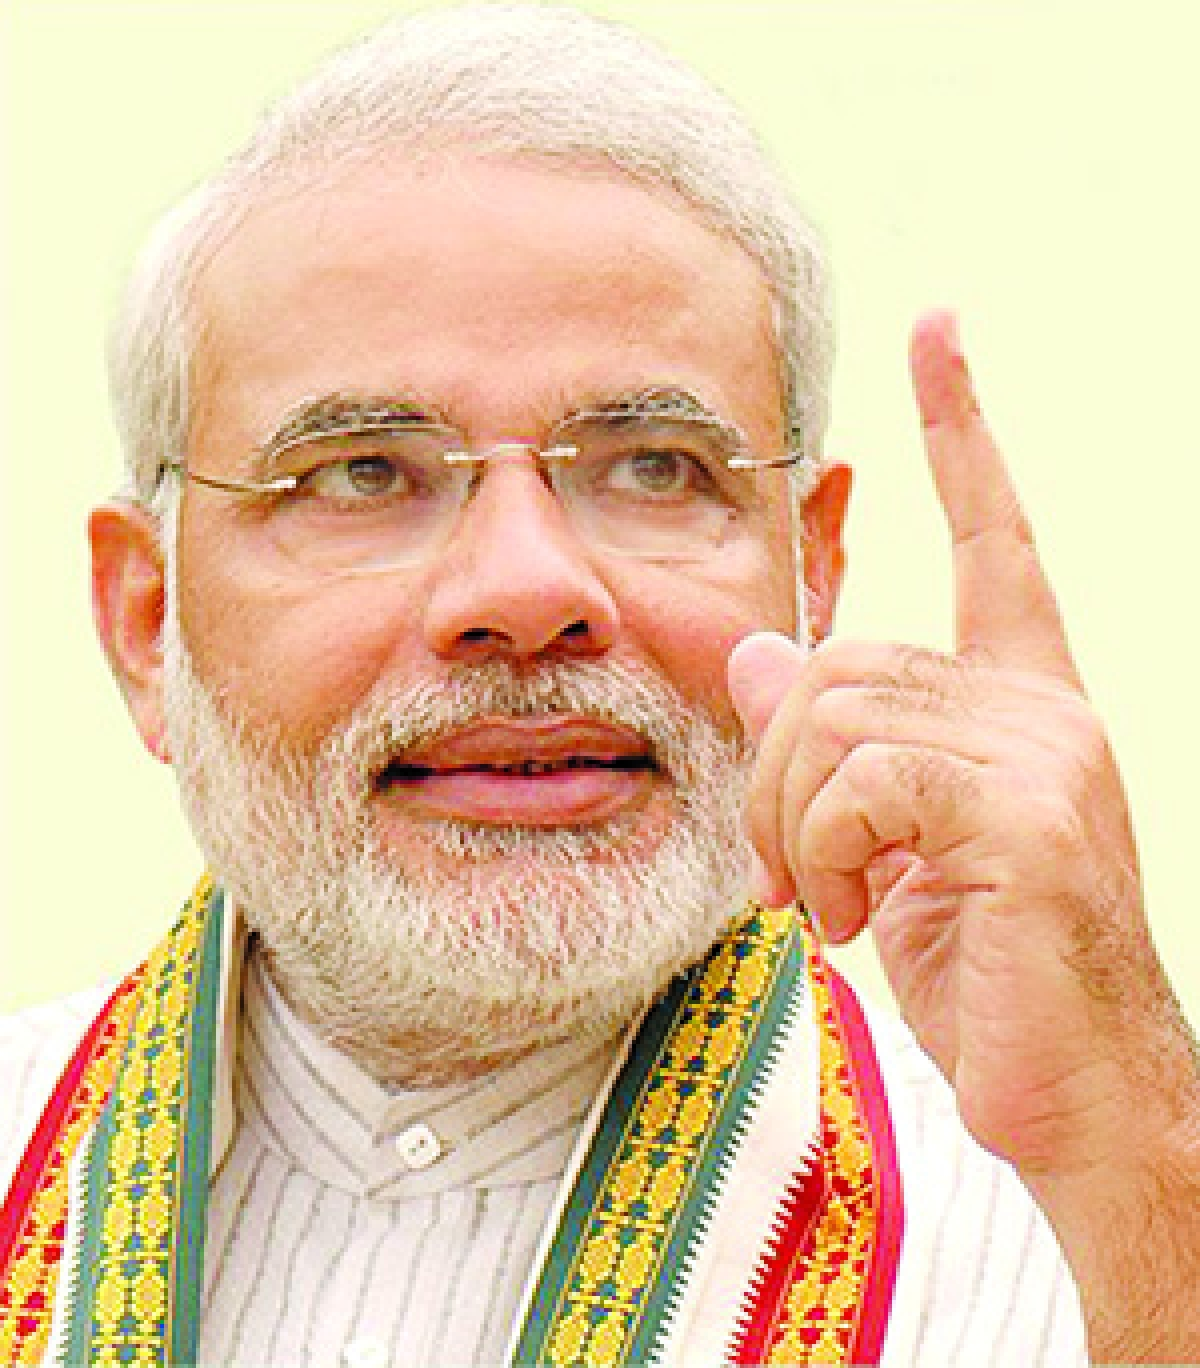 Modi has pvt army in cyberspace: Sibal